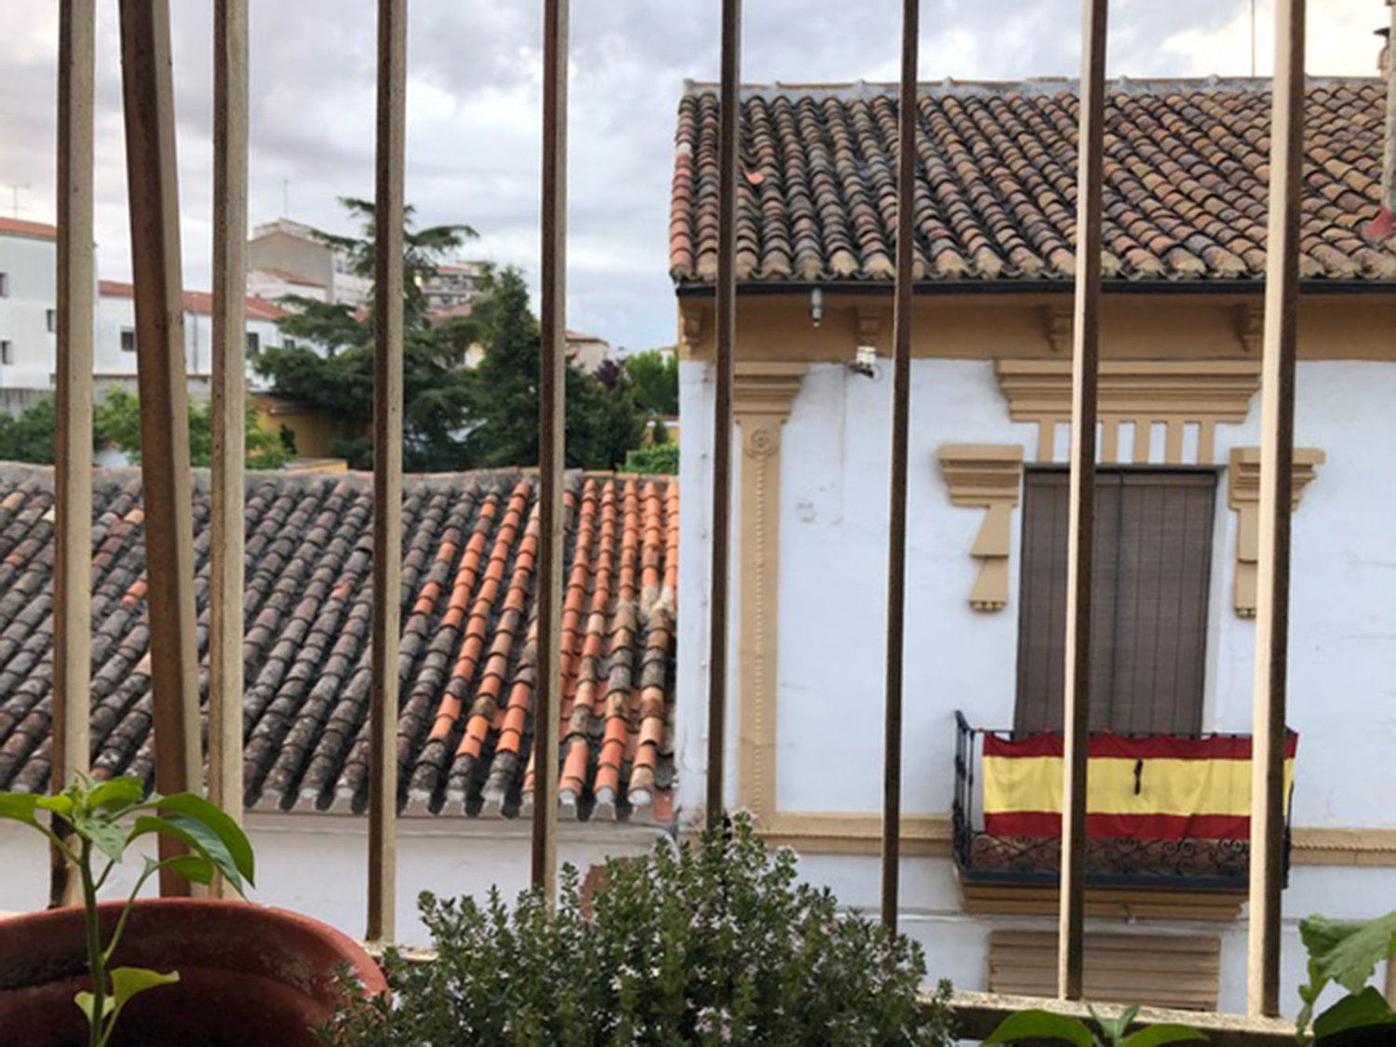 Locked down in La Mancha